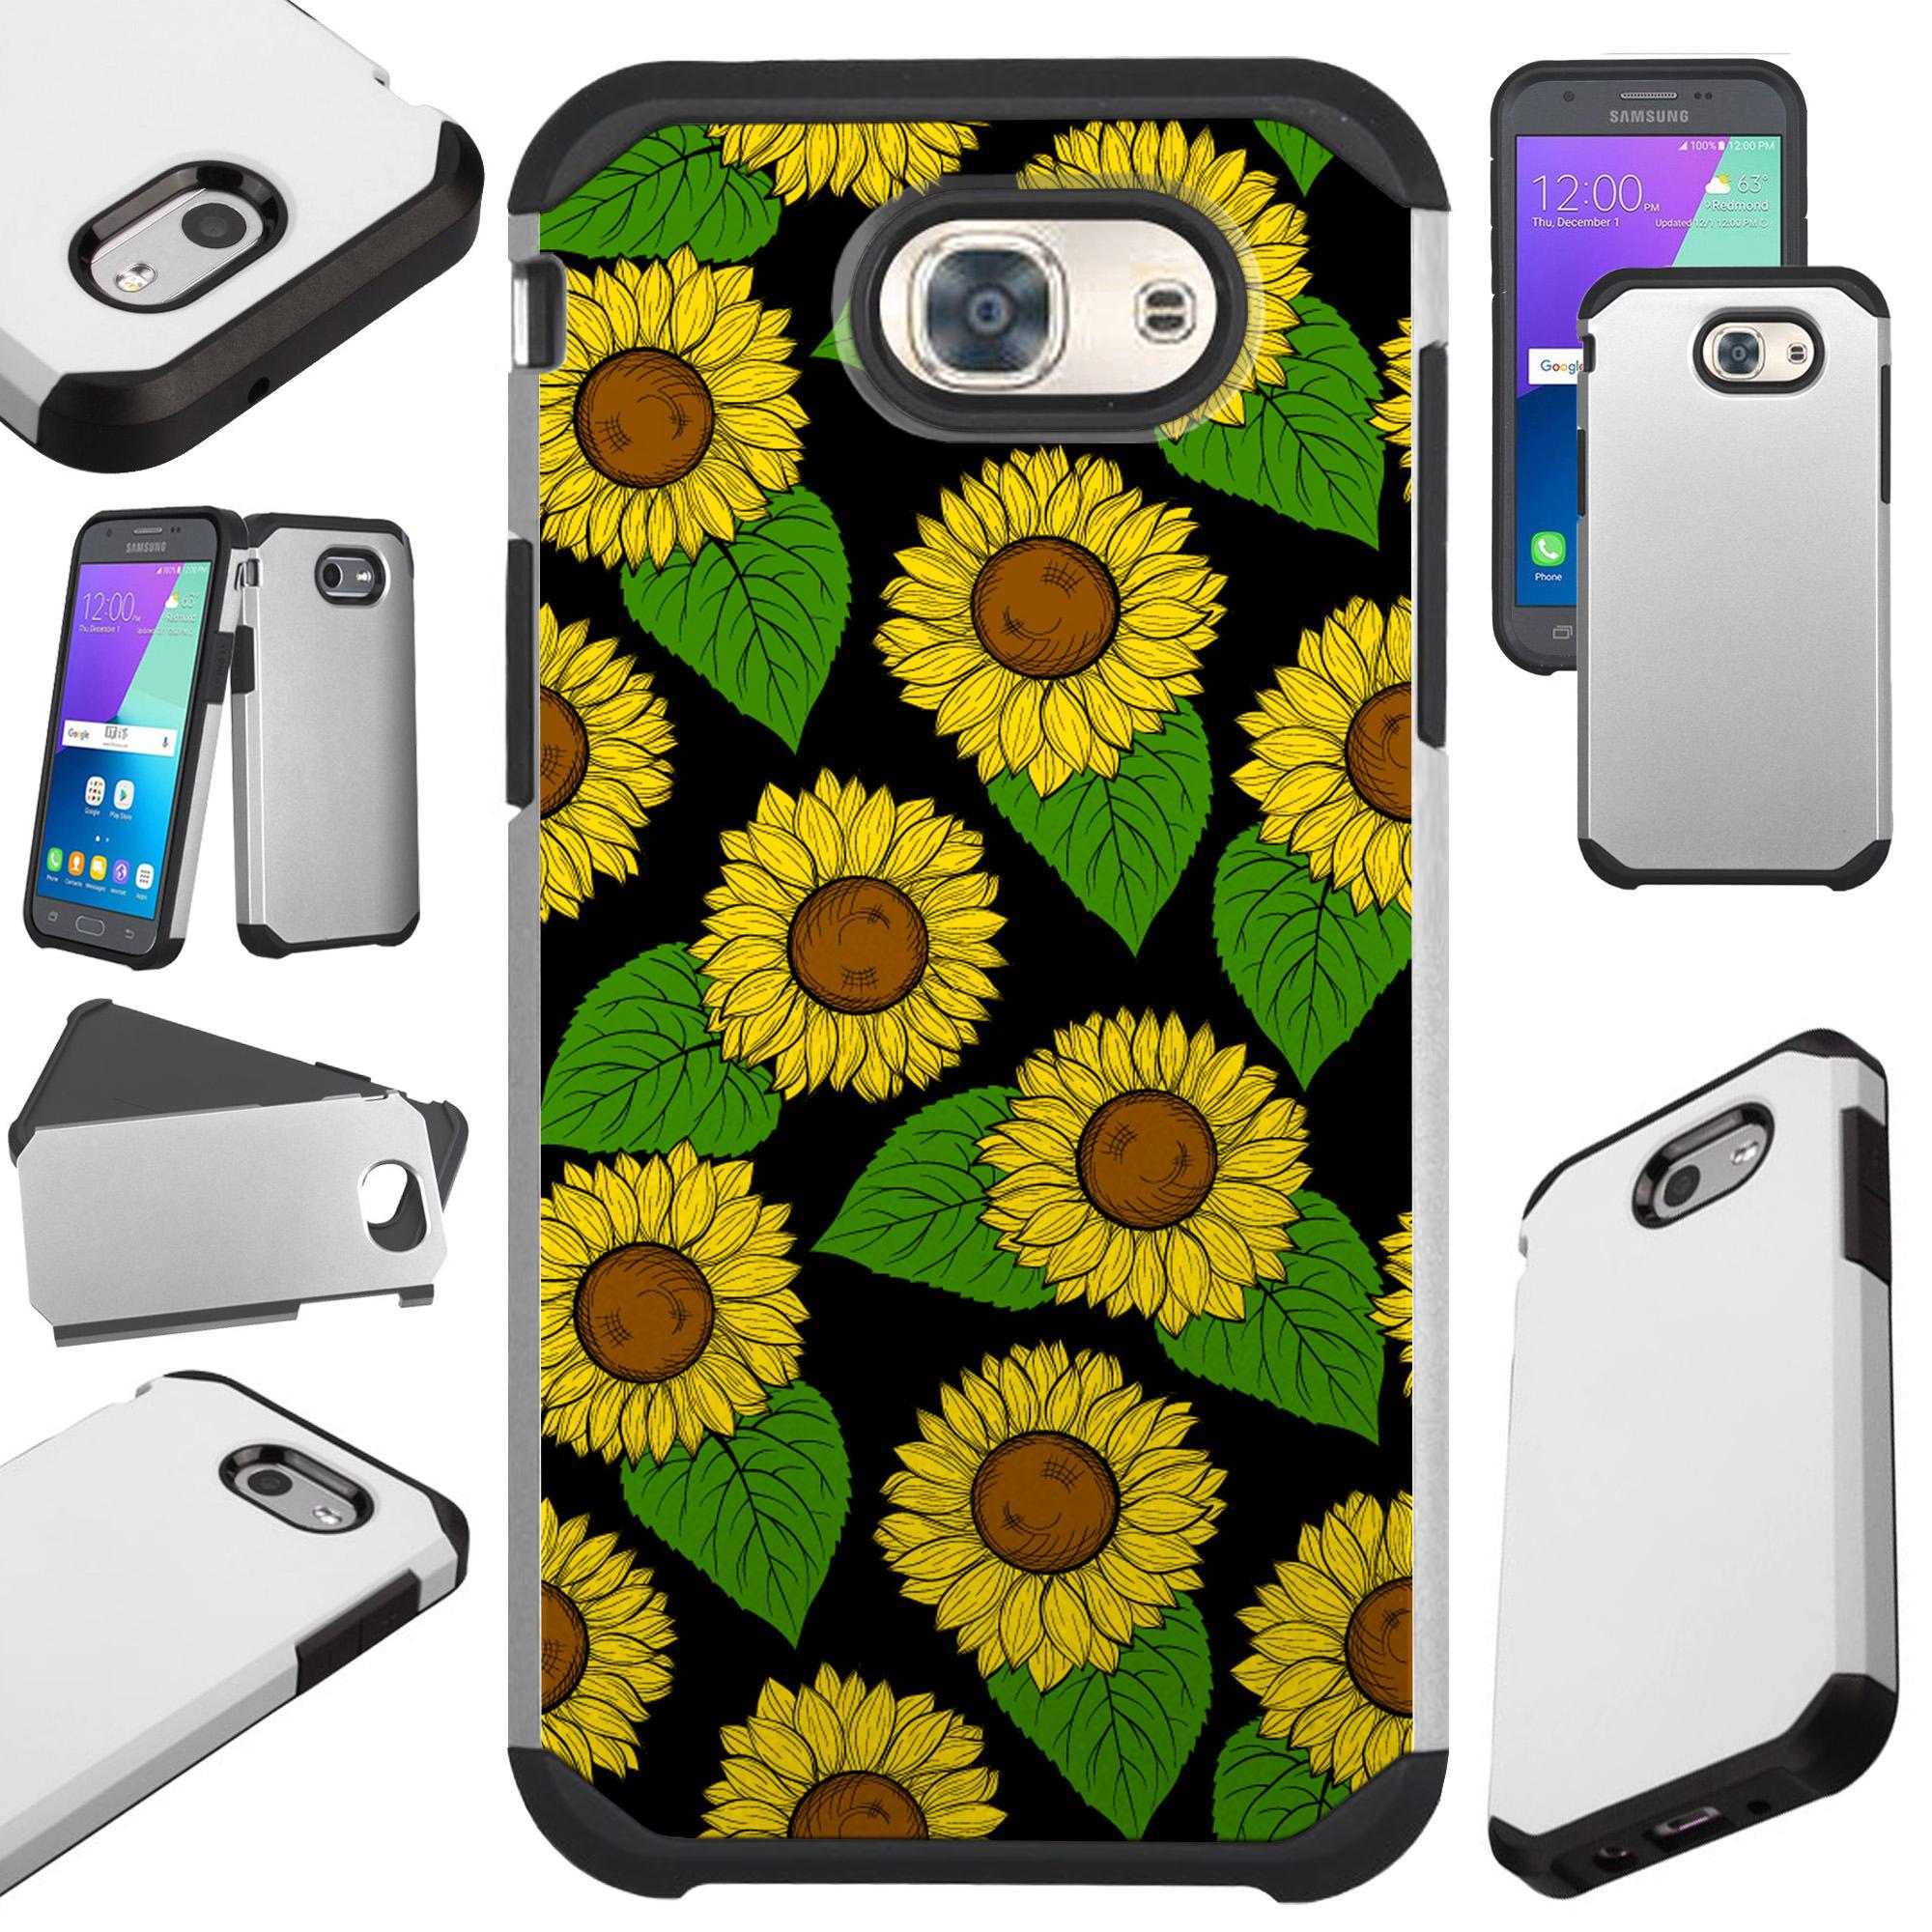 For Samsung Galaxy J3 (2017) / J3 Emerge / J3 Mission / J3 Eclipse / J3 Luna Pro / J3 Prime / Sol 2 / Amp Prime 2 / Express Prime 2 Case Hybrid TPU Fusion Phone Cover (Sun Flowers)